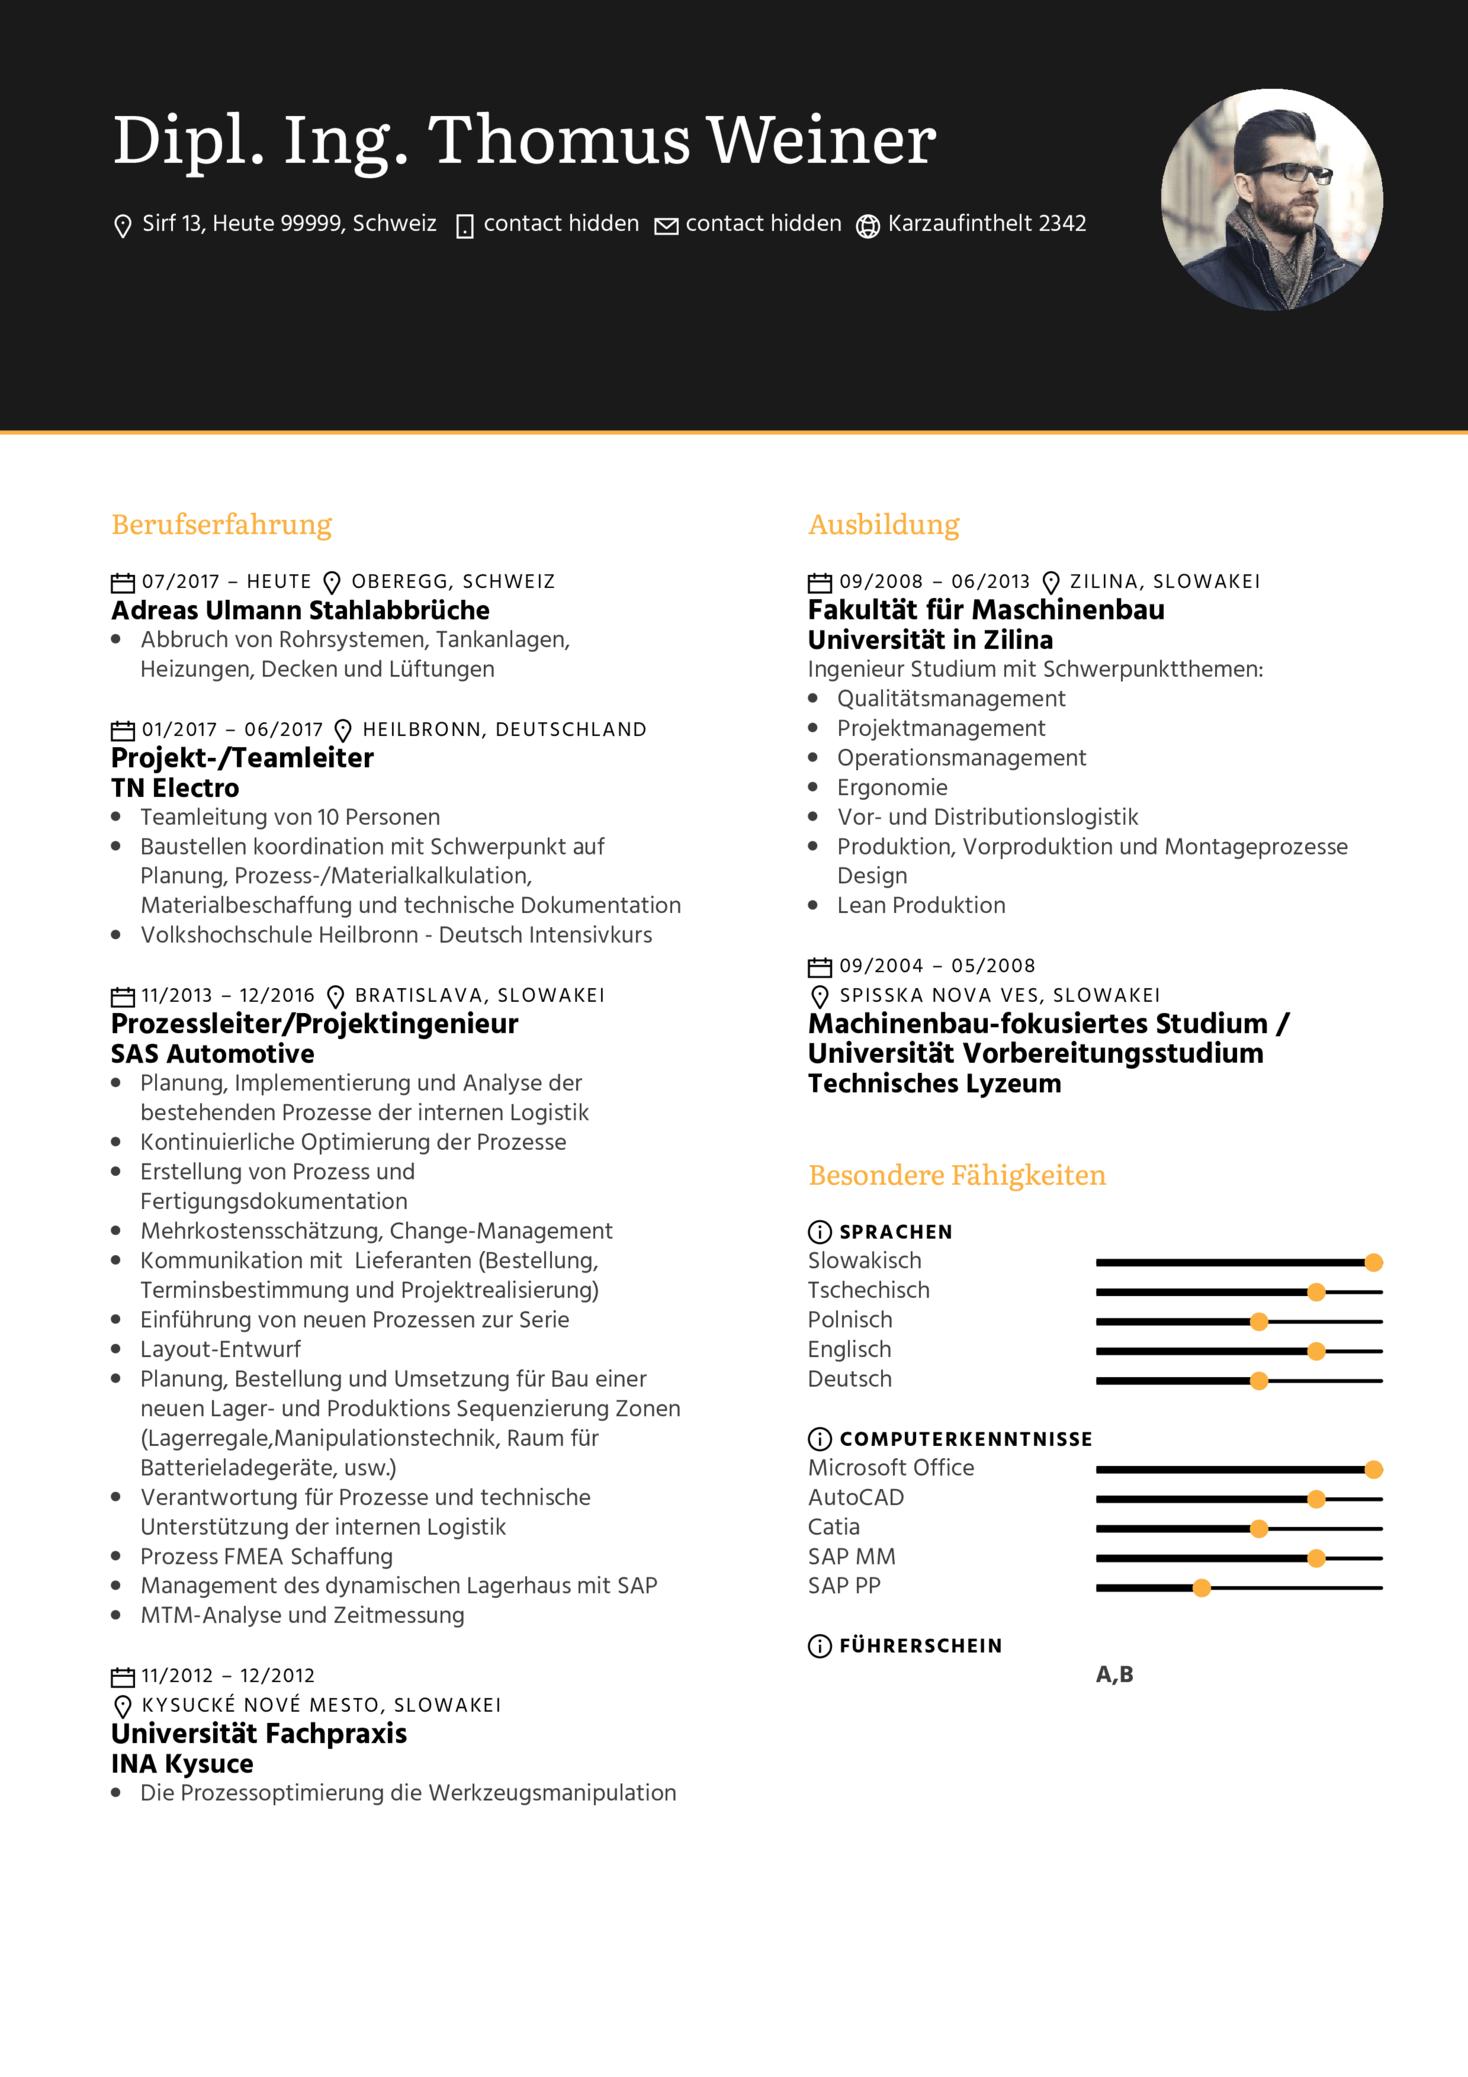 KNAPP Maschinenbauingenieur Lebenslauf Sample (parte 1)